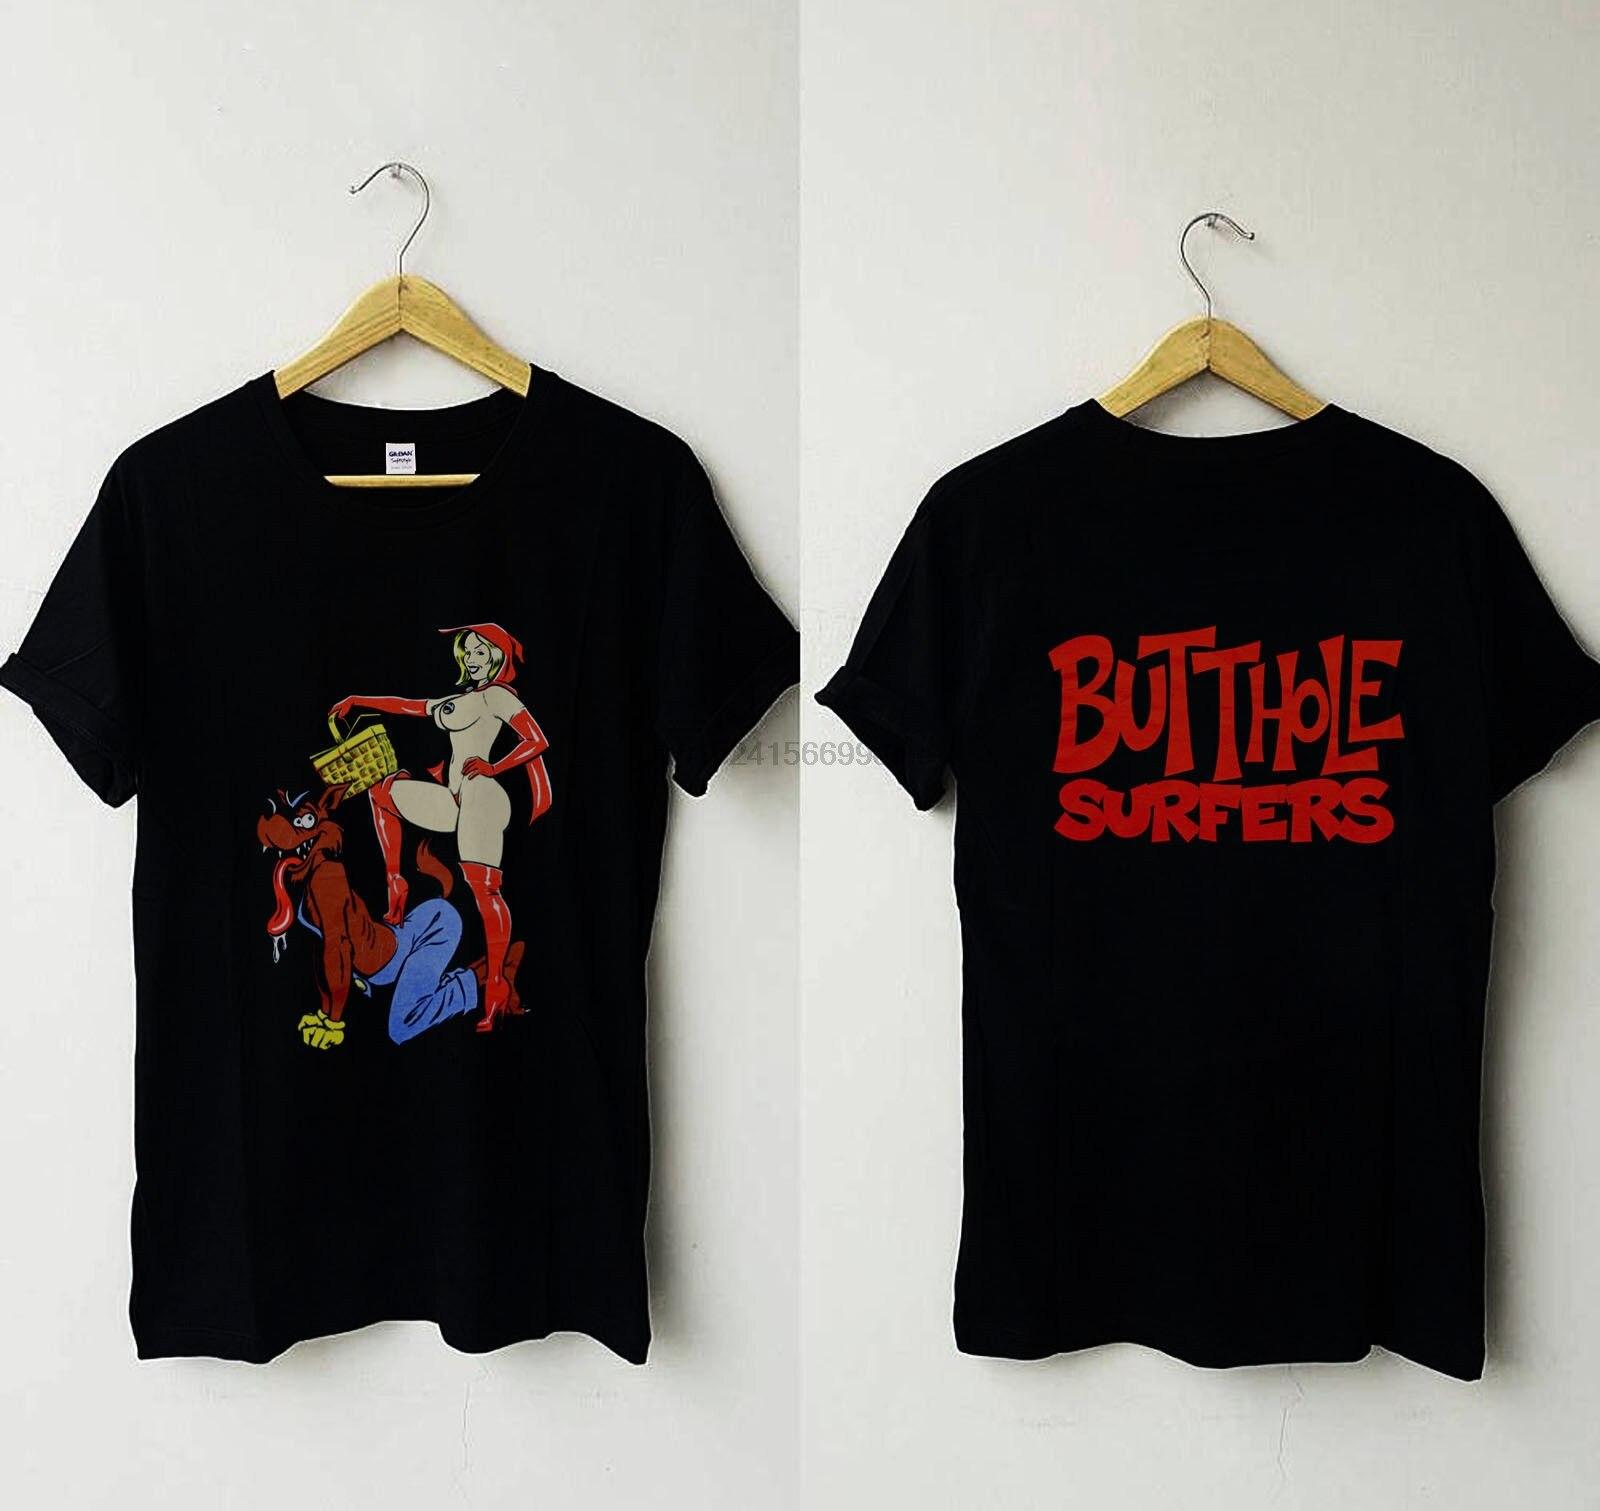 Butthole, camiseta para hombre, Vintage 1990s, Caperucita Roja, Reimpresión de lobo malo grande